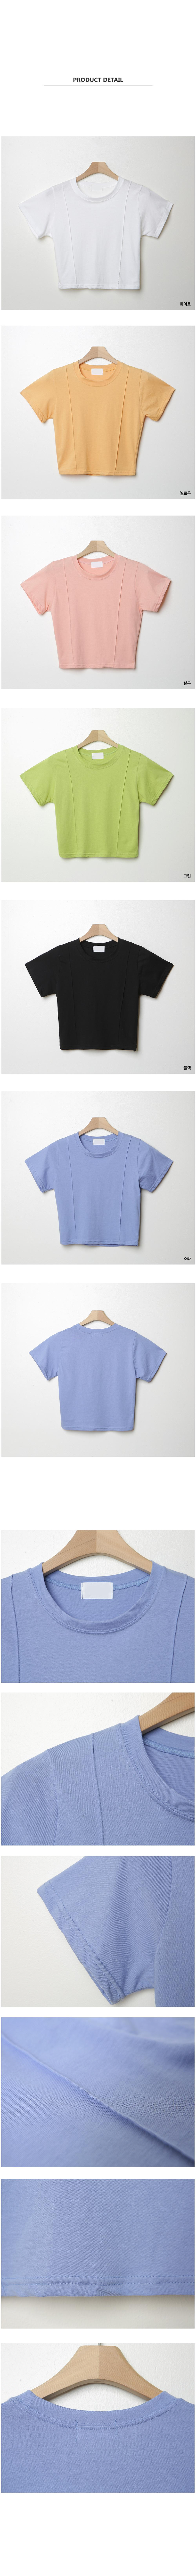 Pin tuck crop plain short-sleeved cropped Split t-shirt T # YW782